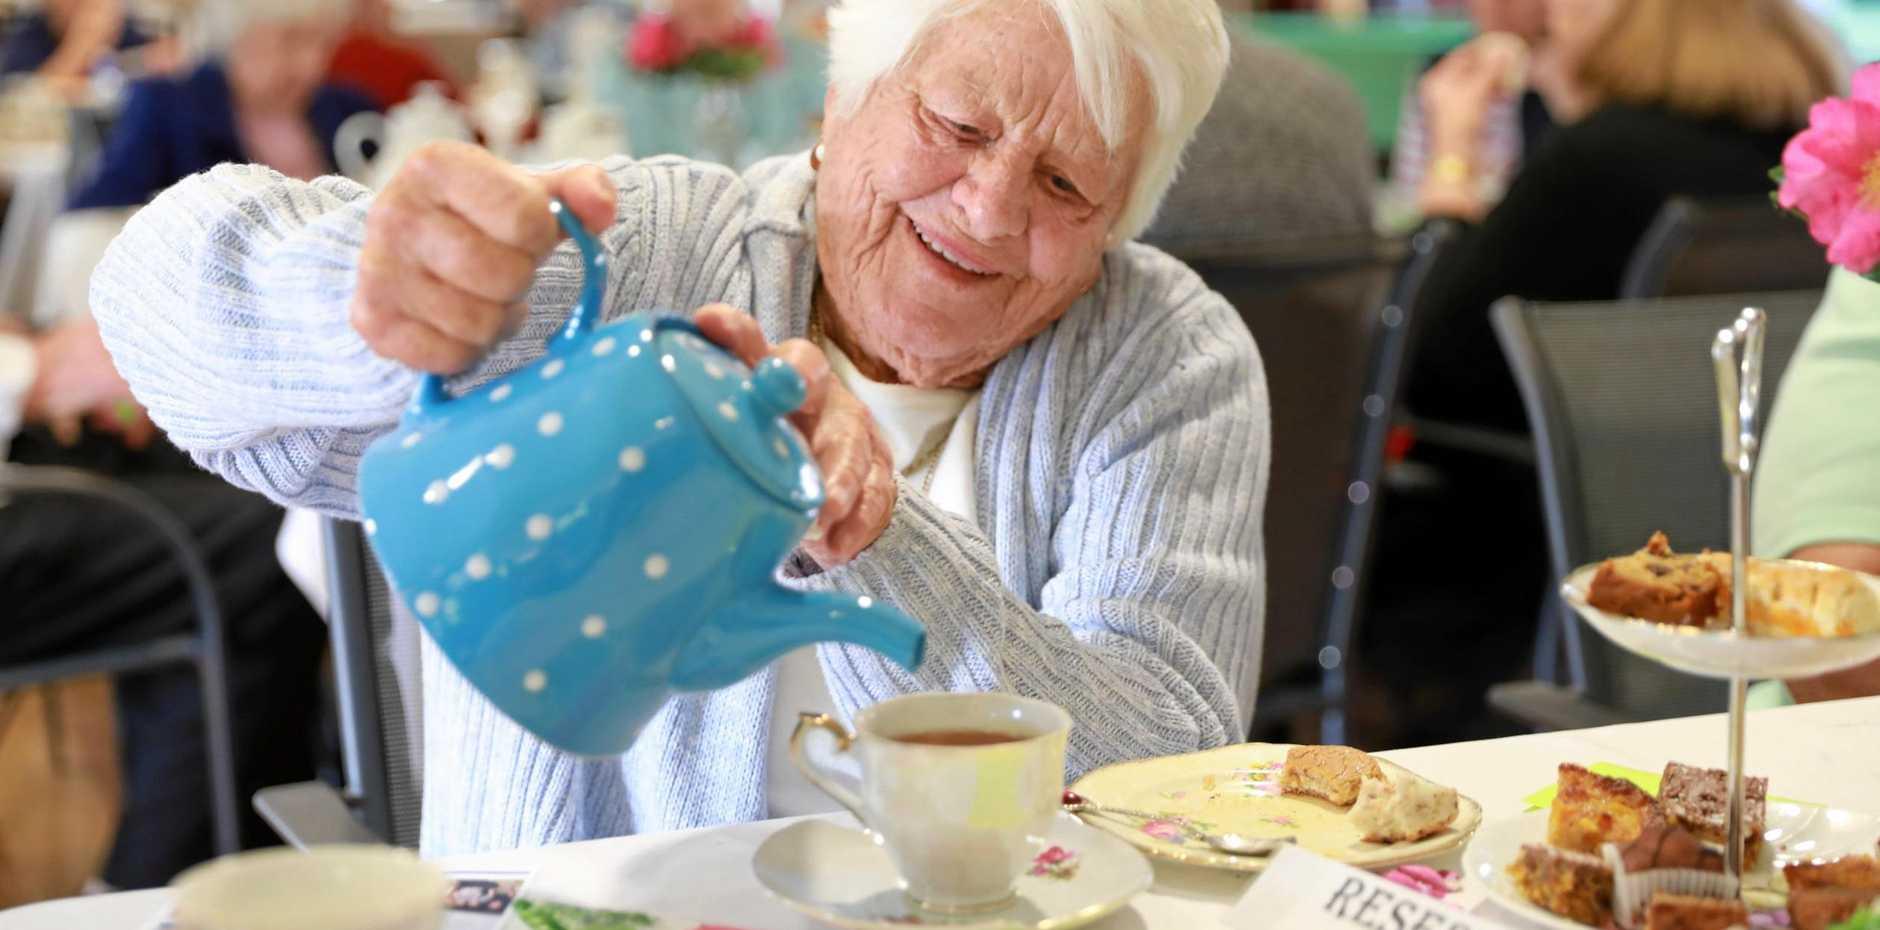 Jewells Lifestyle Community friend Carmel Johnson enjoys a cuppa at the village's Biggest Morning Tea fundraiser.